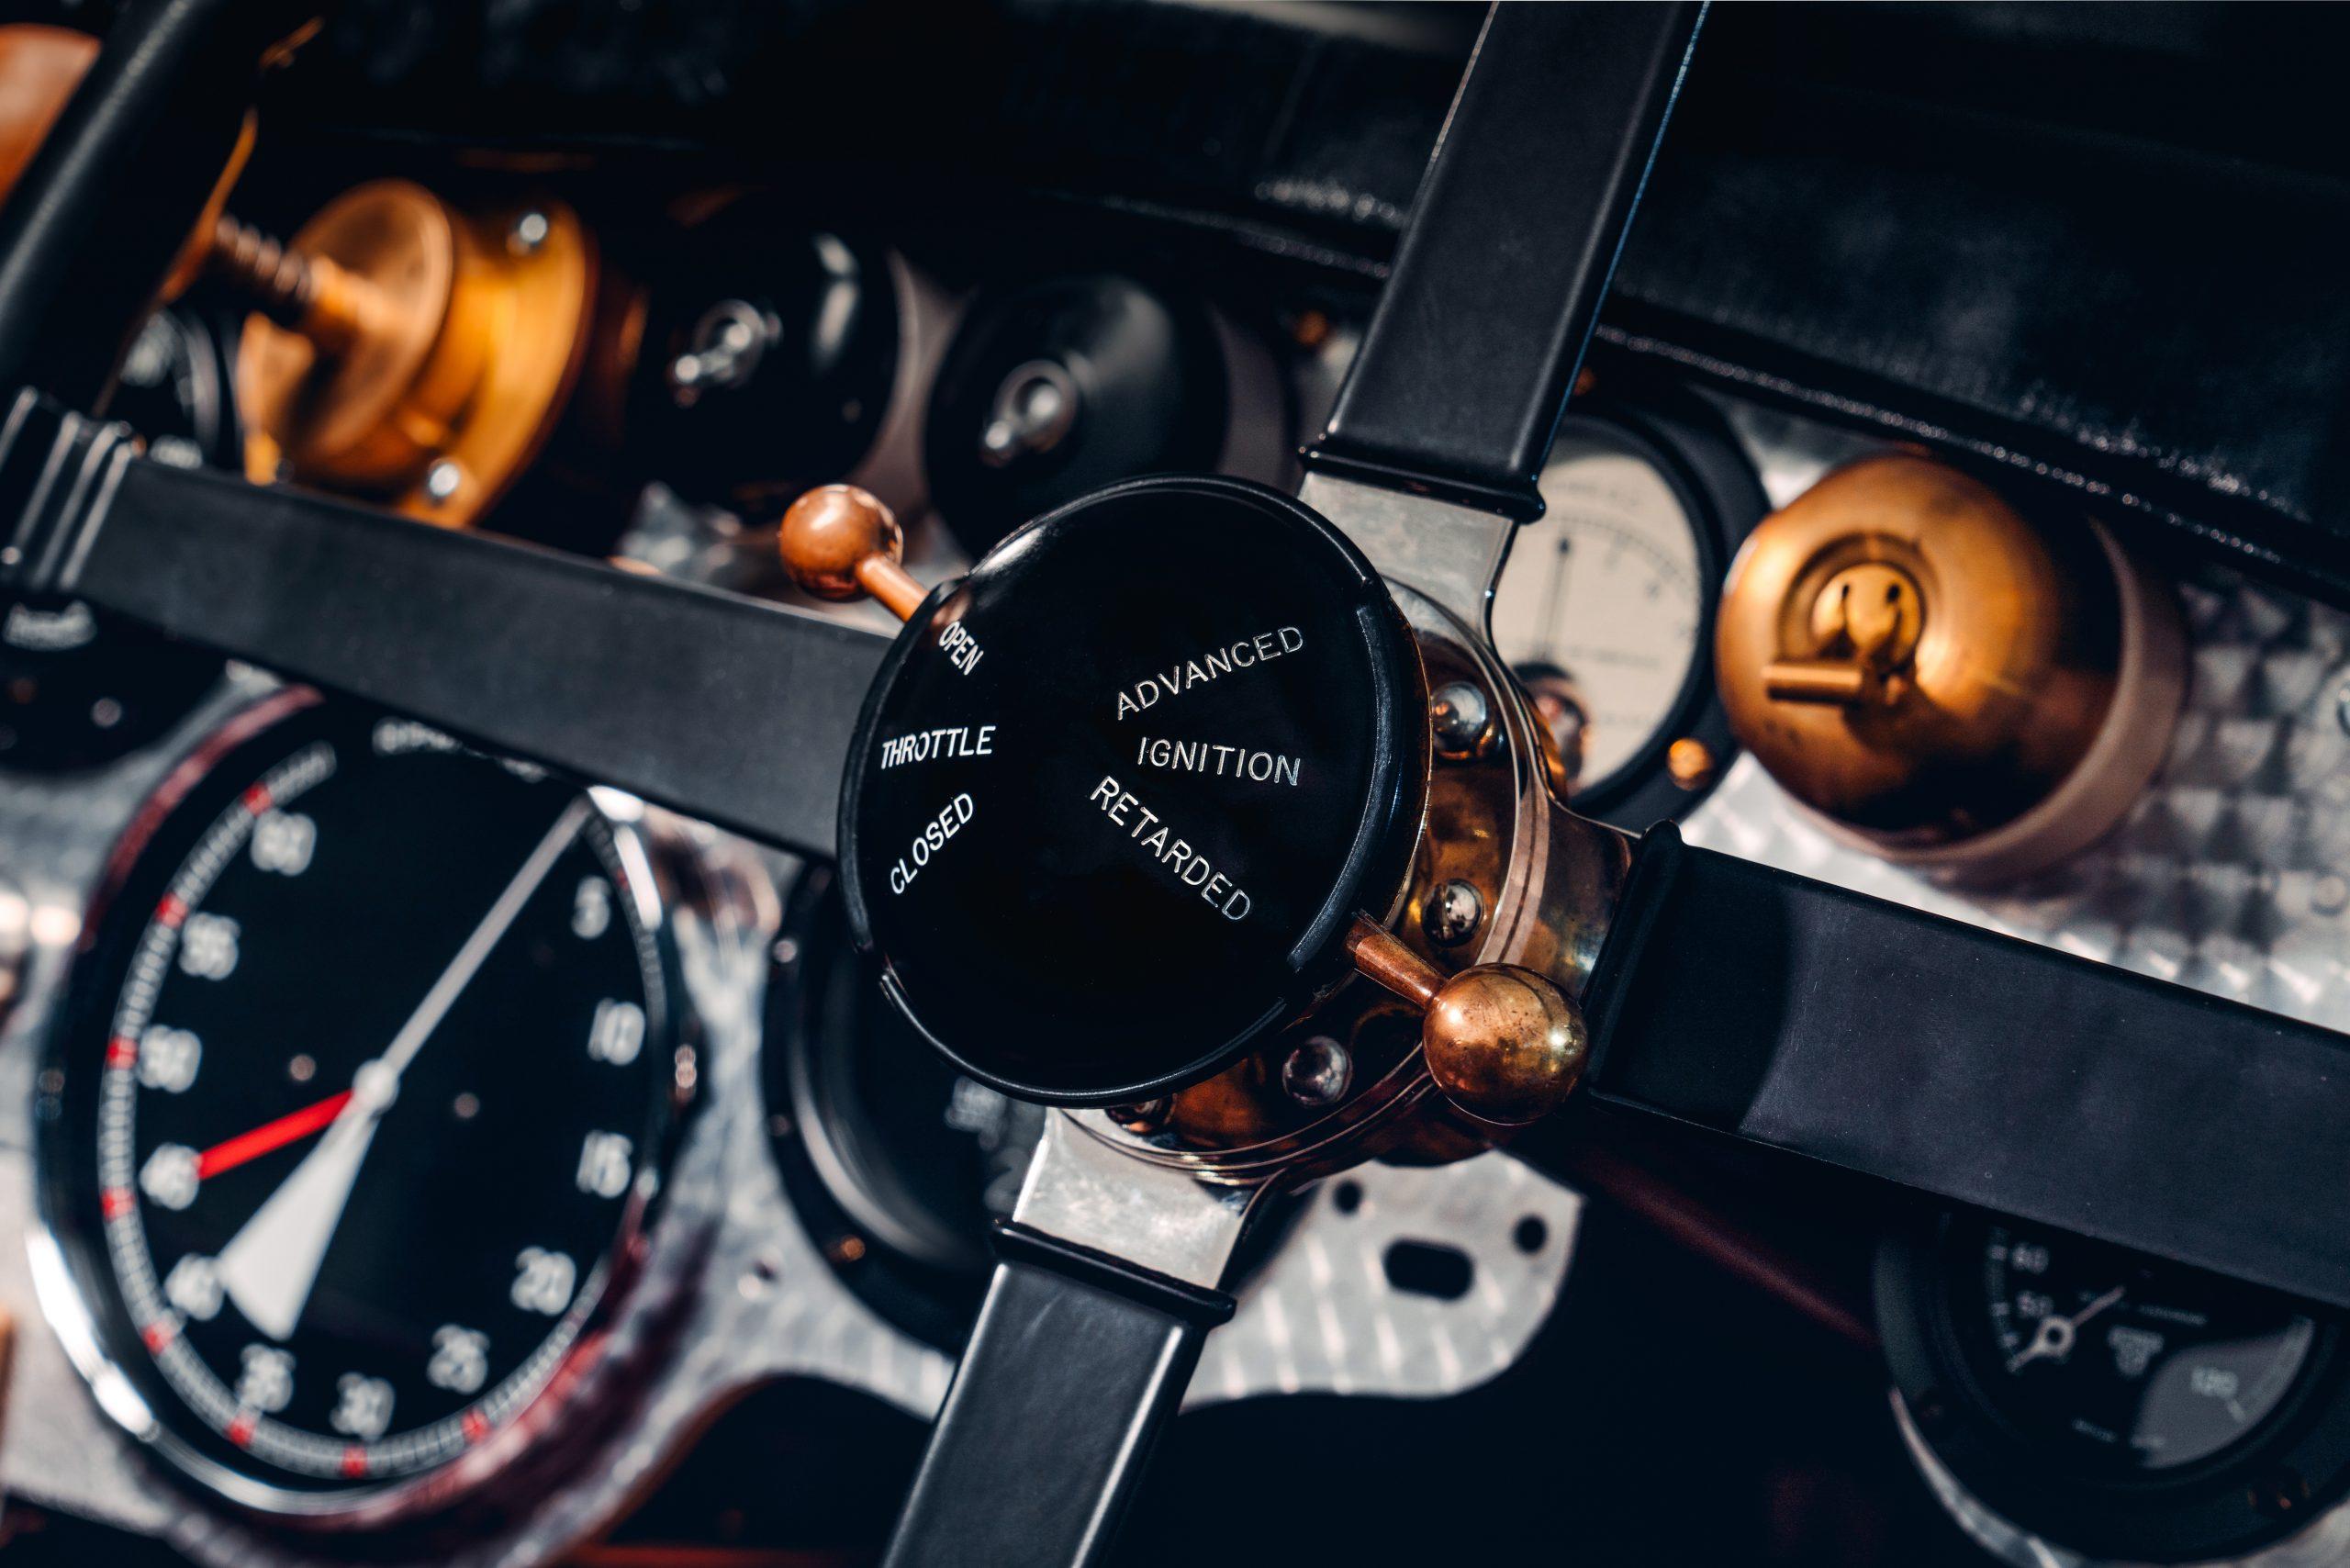 Bentley Blower Car Zero detail ignition throttle timing steering wheel